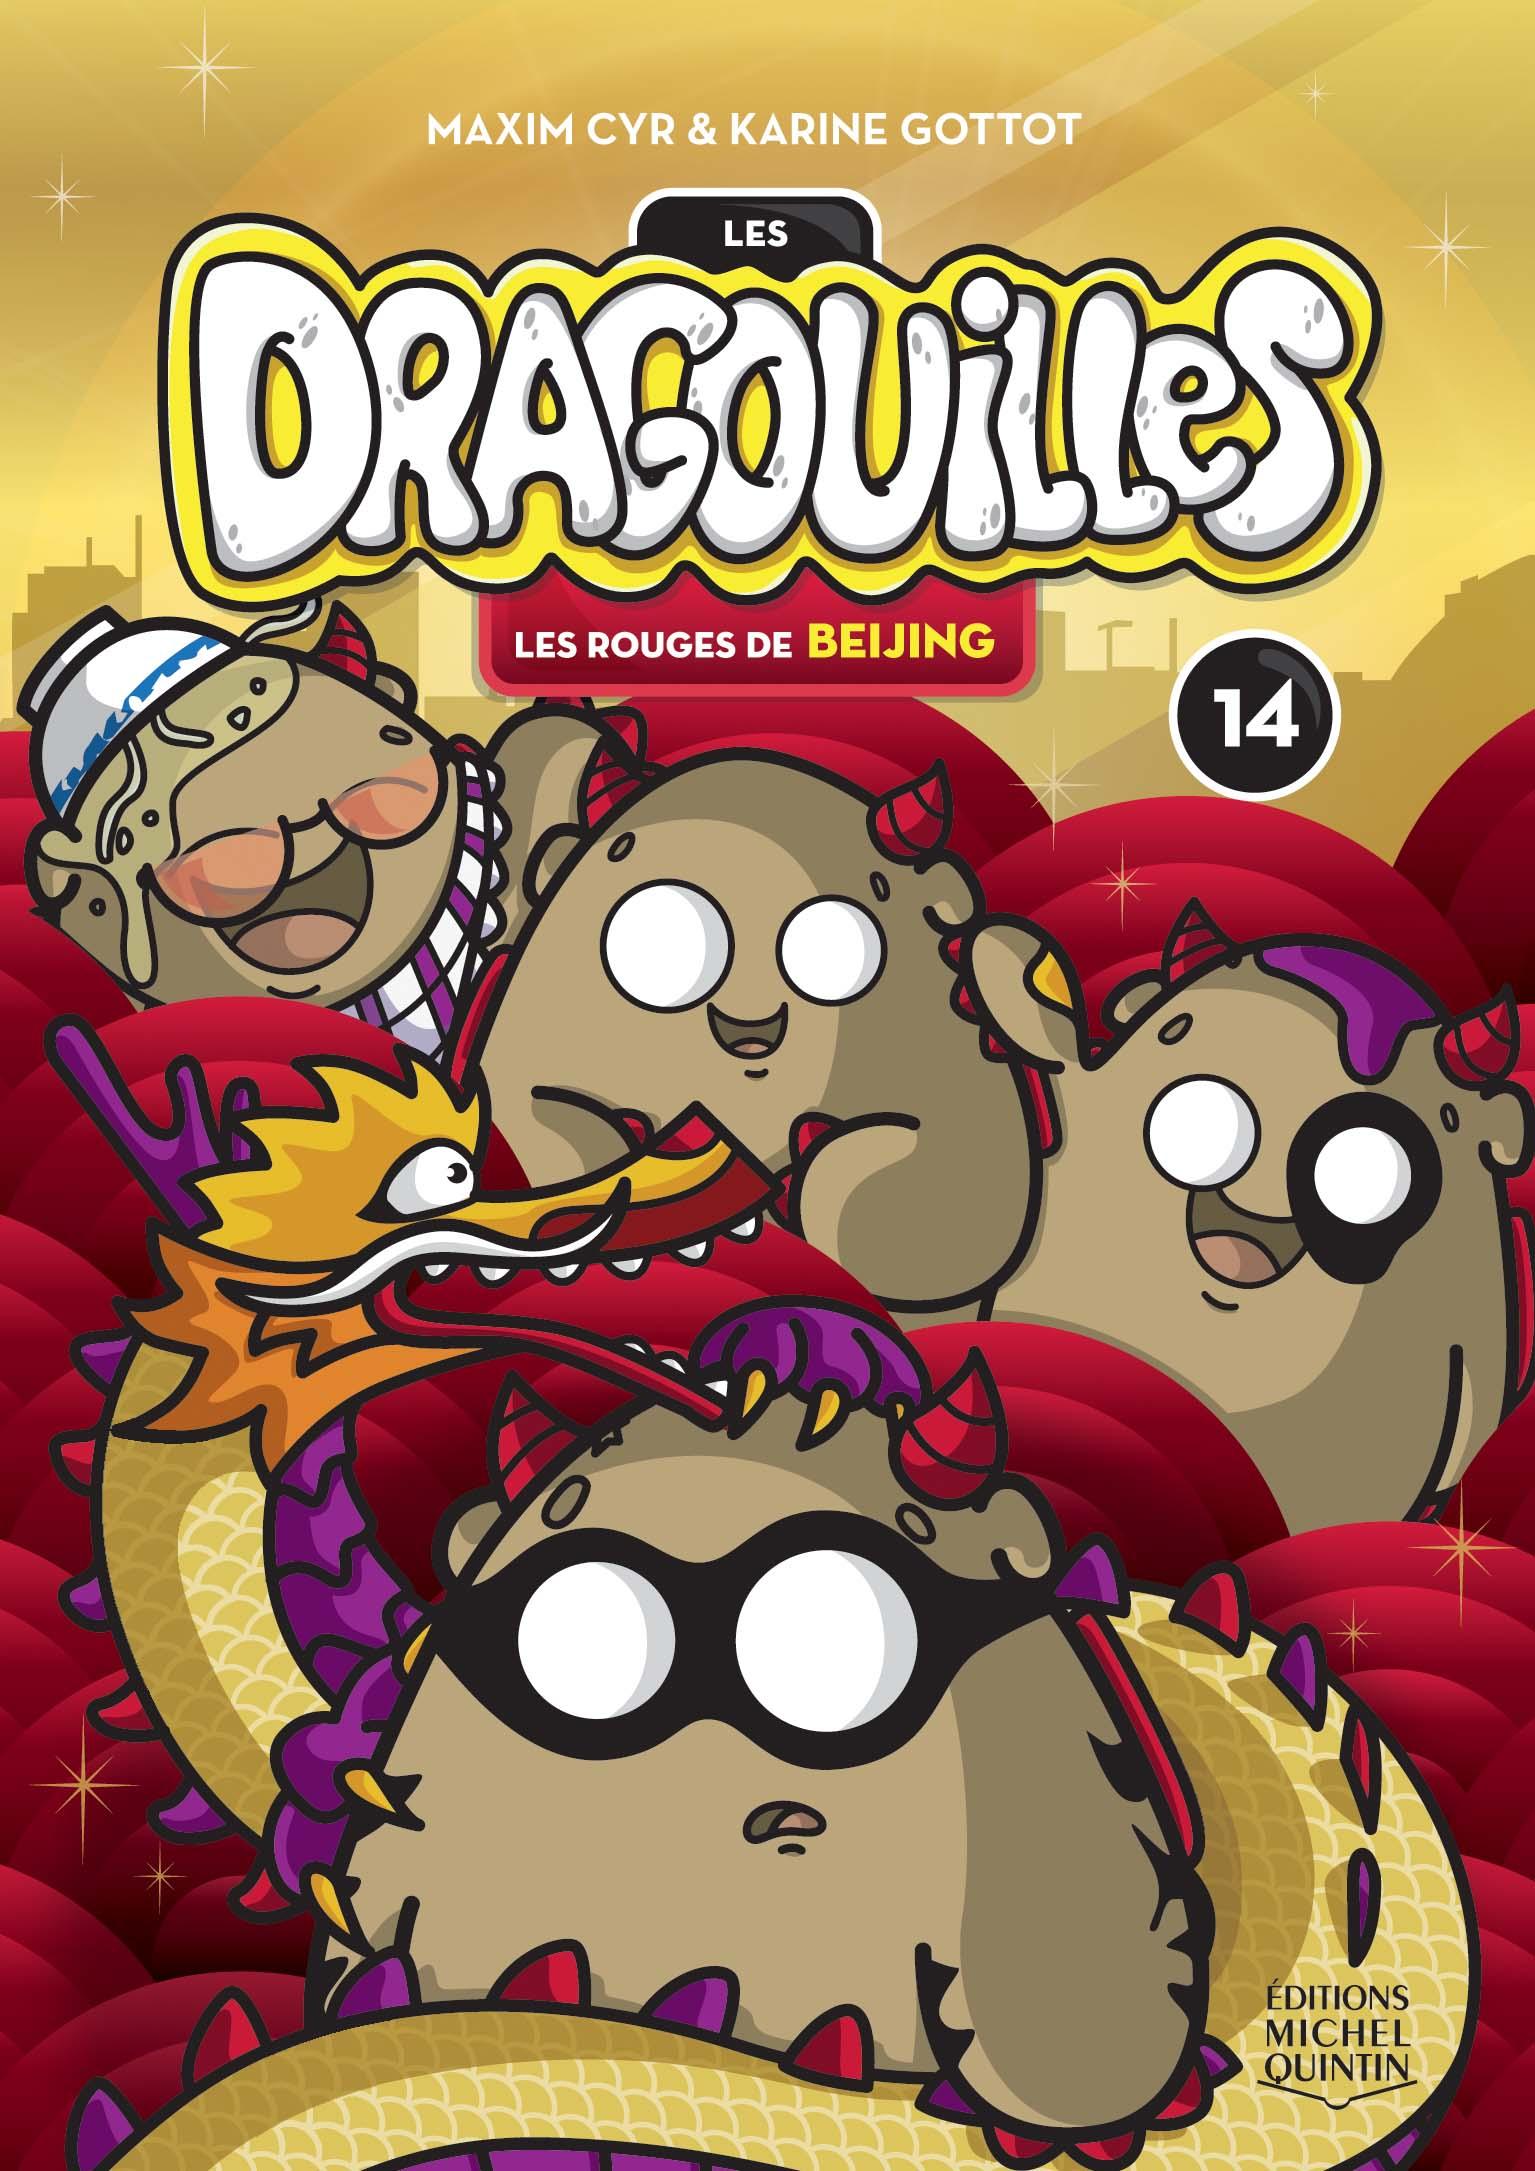 Les dragouilles 14 - Les ro...